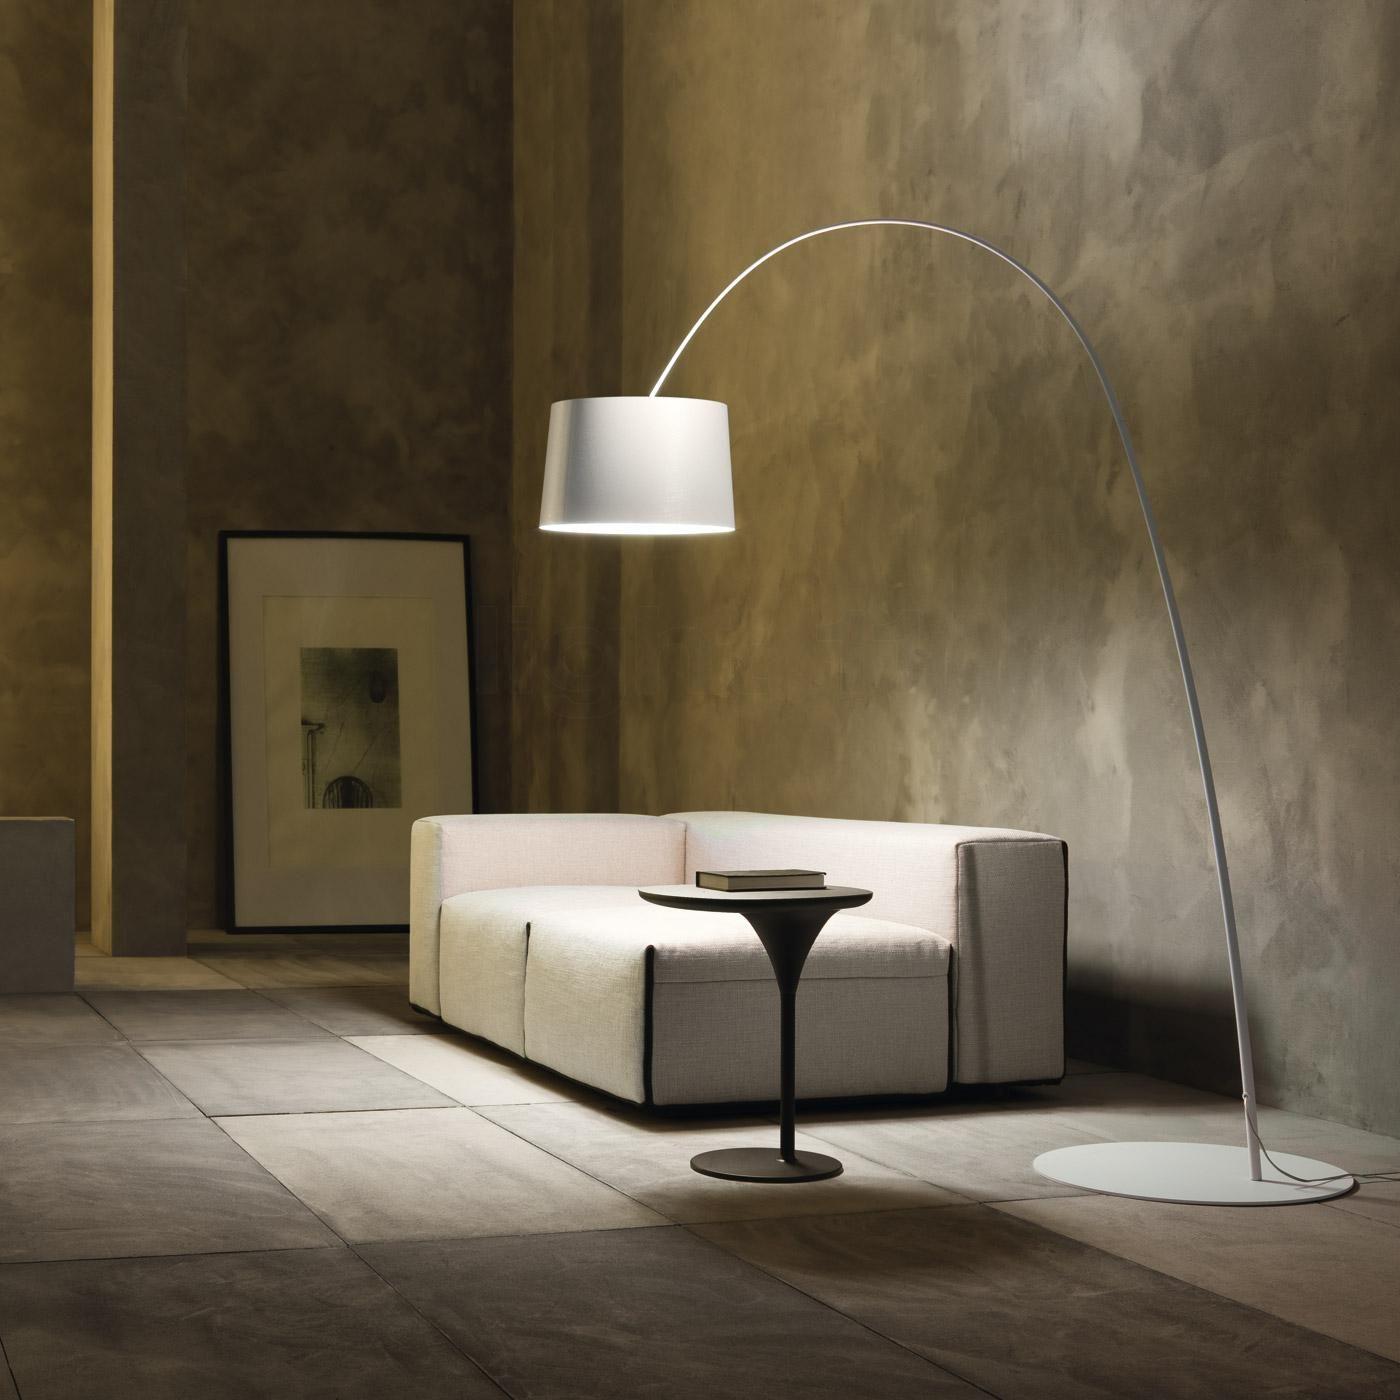 Lampada Da Terra Twiggy Foscarini.Foscarini Twiggy Terra Stehleuchten Cool Floor Lamps